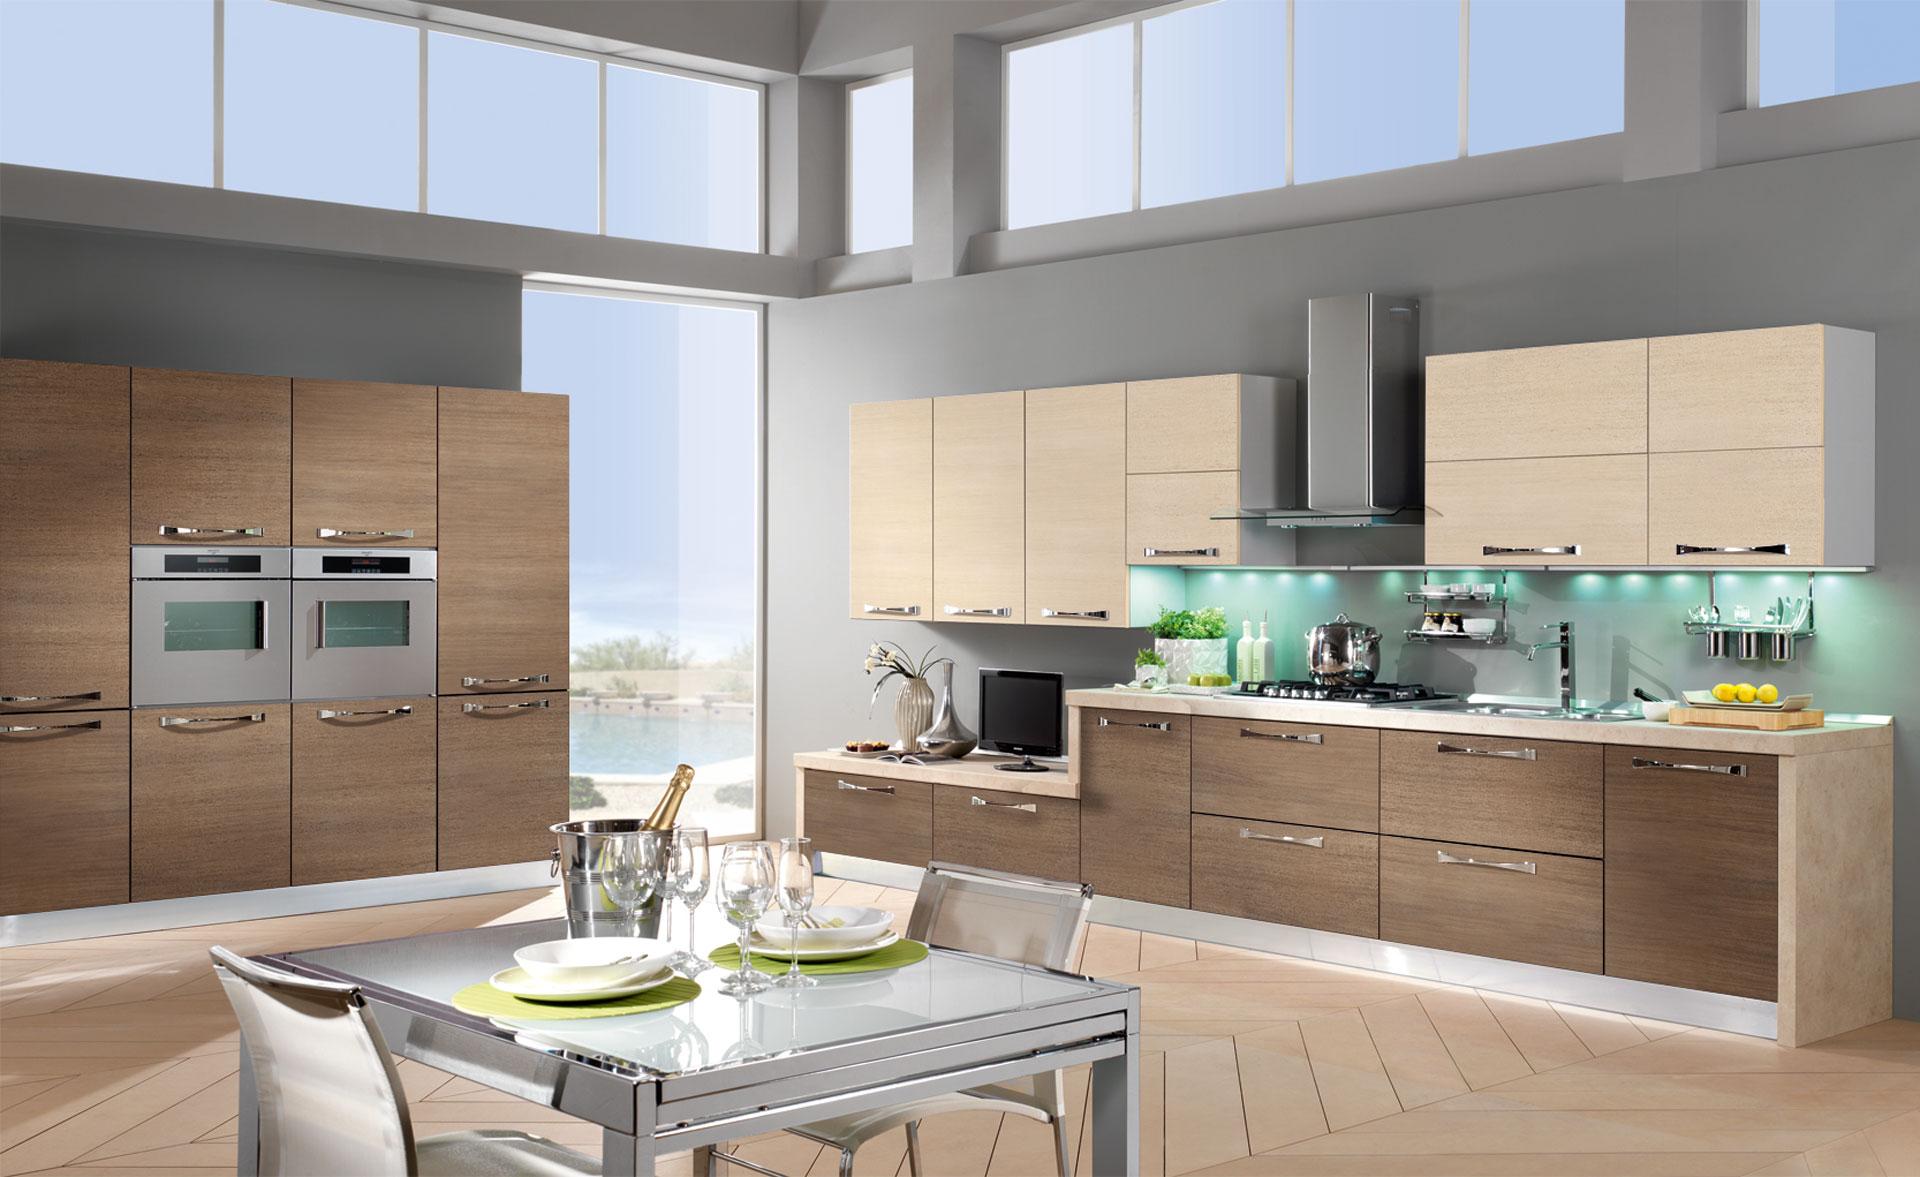 Modern Kitchens Vedi Cucine divdiv class